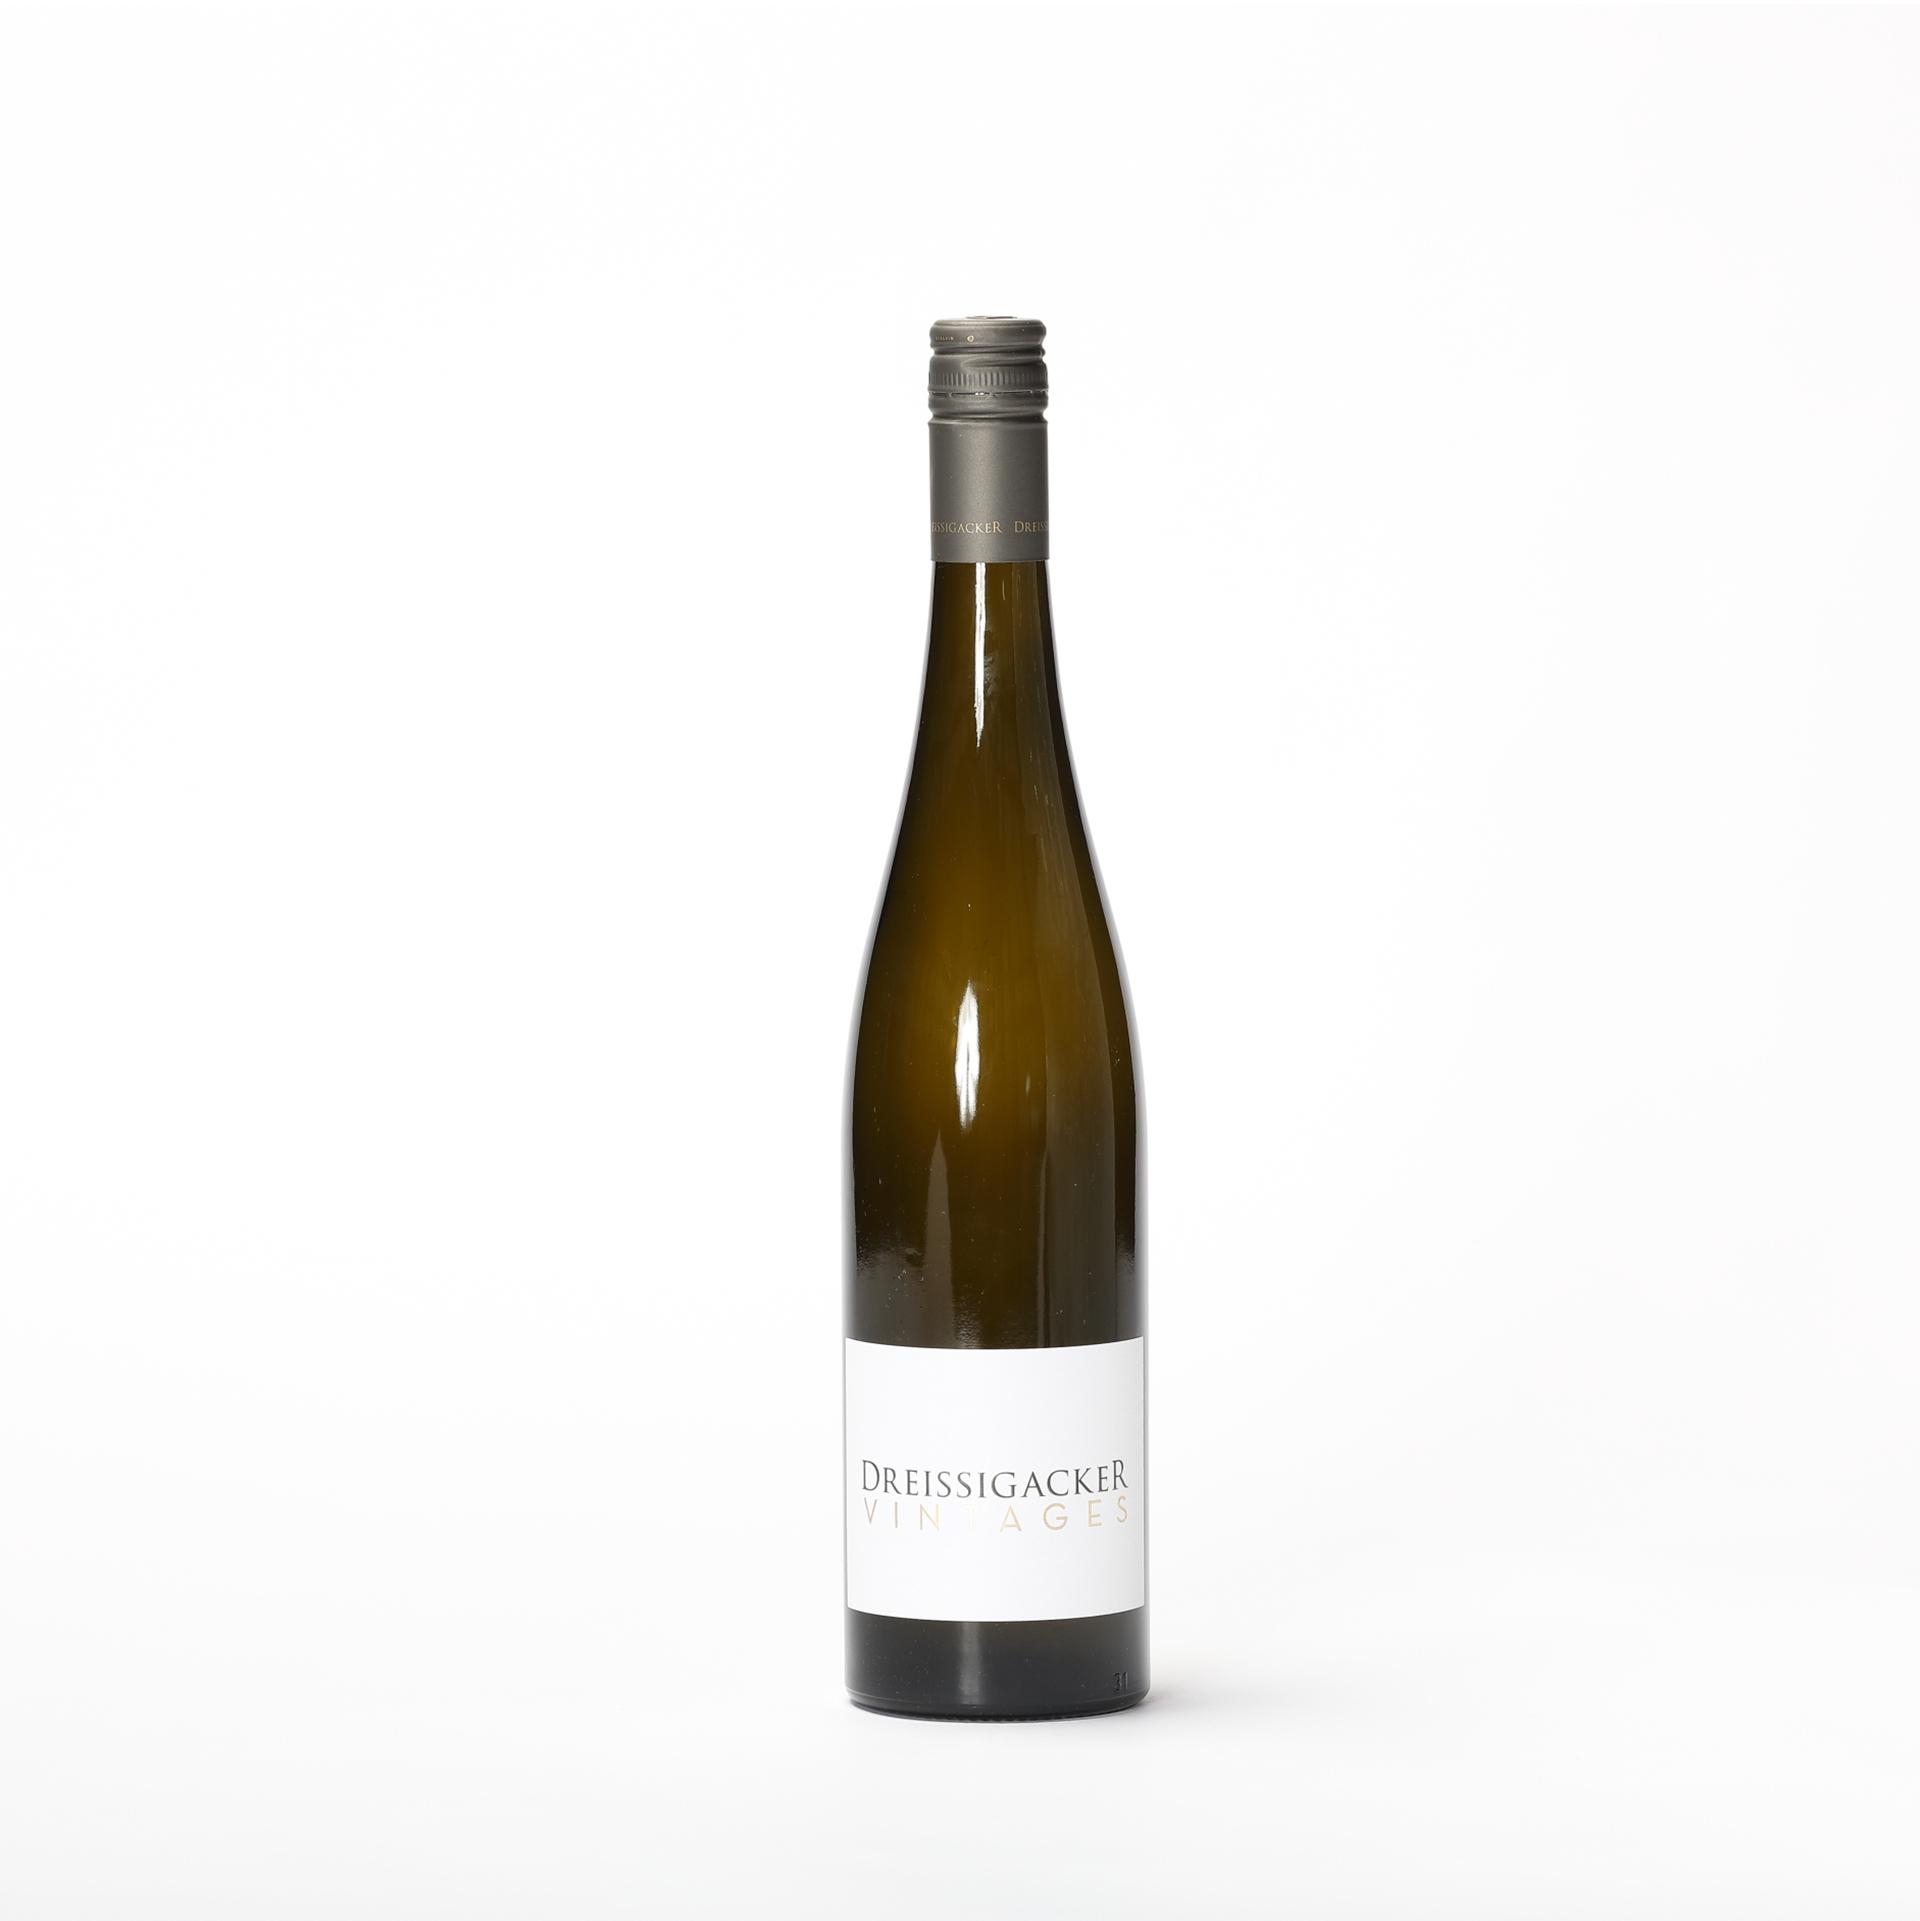 Vintages Riesling - Weingut Dreissigacker